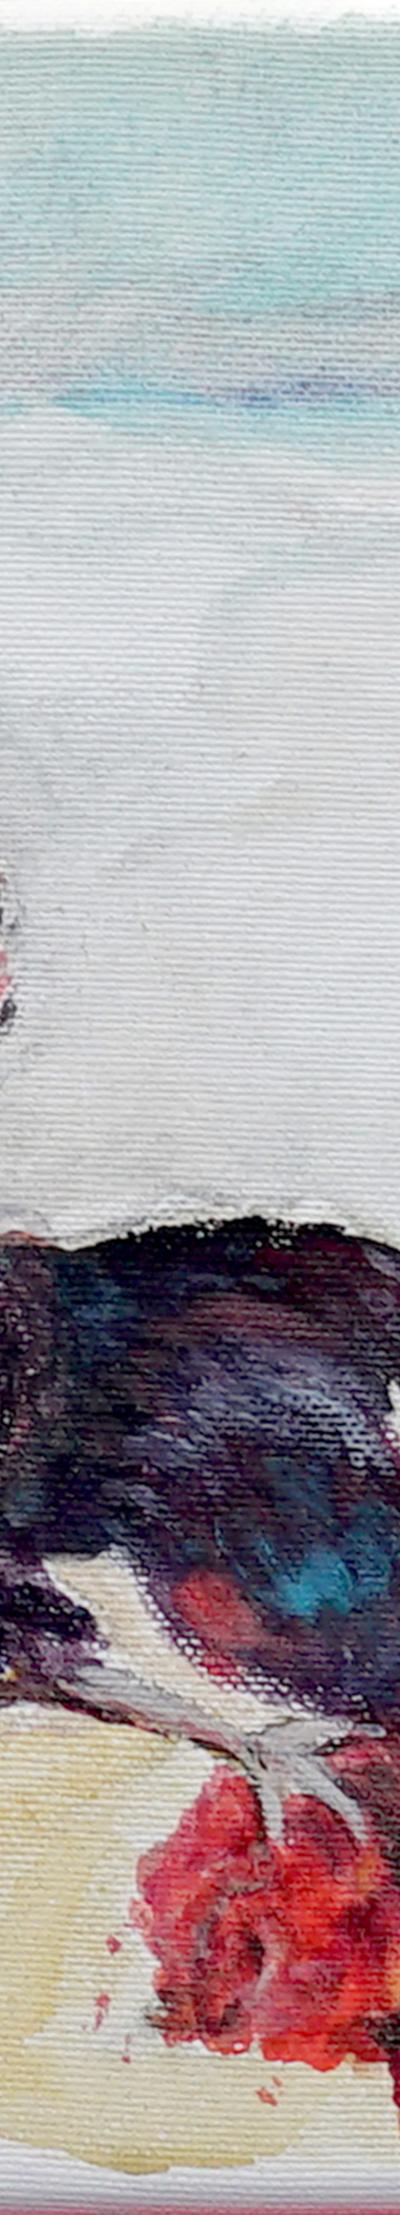 struggle  24x30 cm, oil on canvas